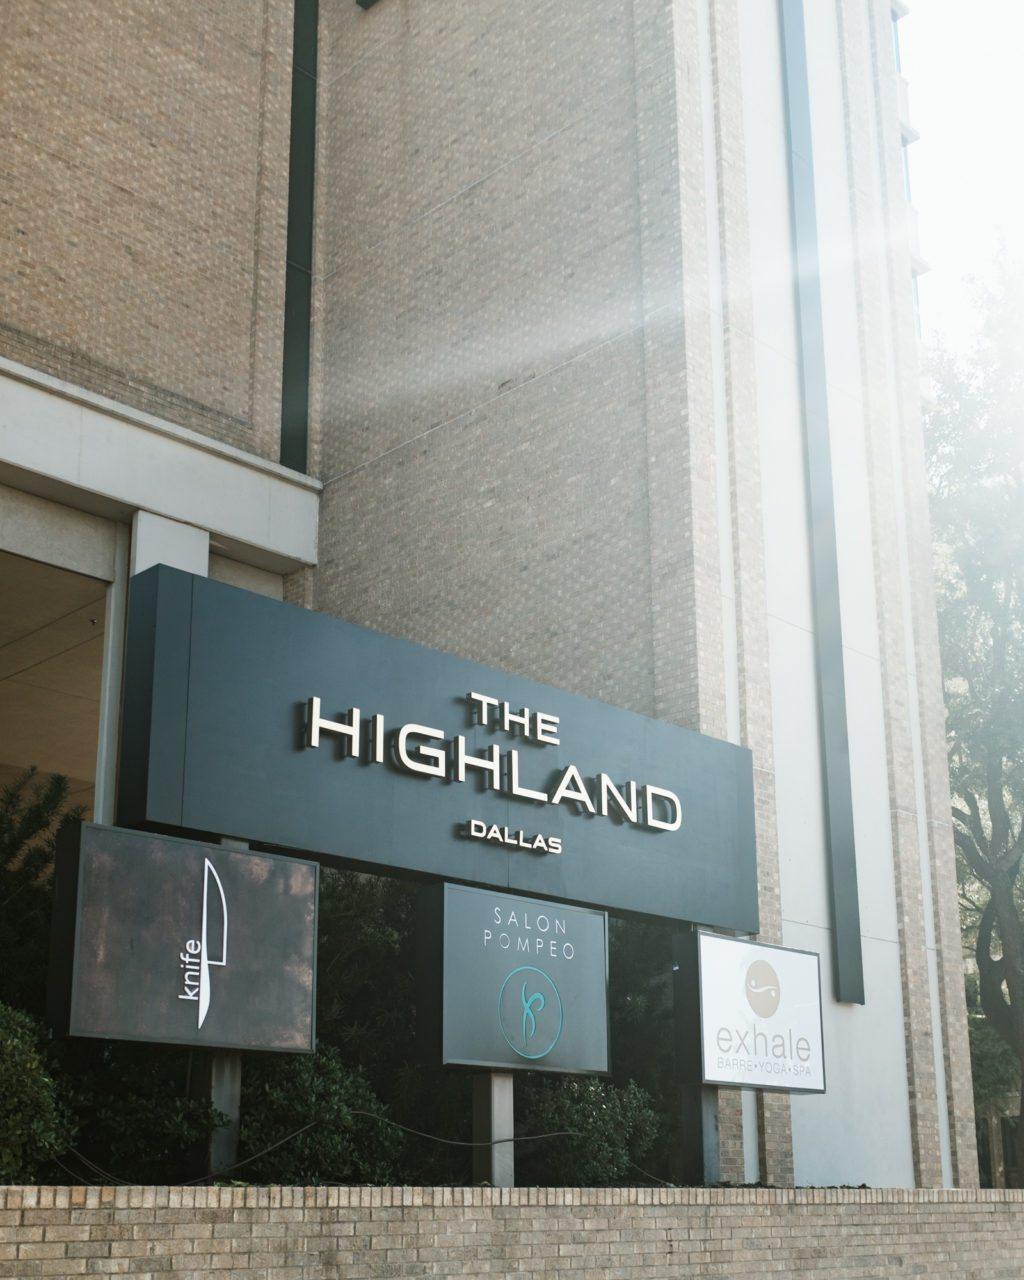 the-highland-dallas-hotel-1674